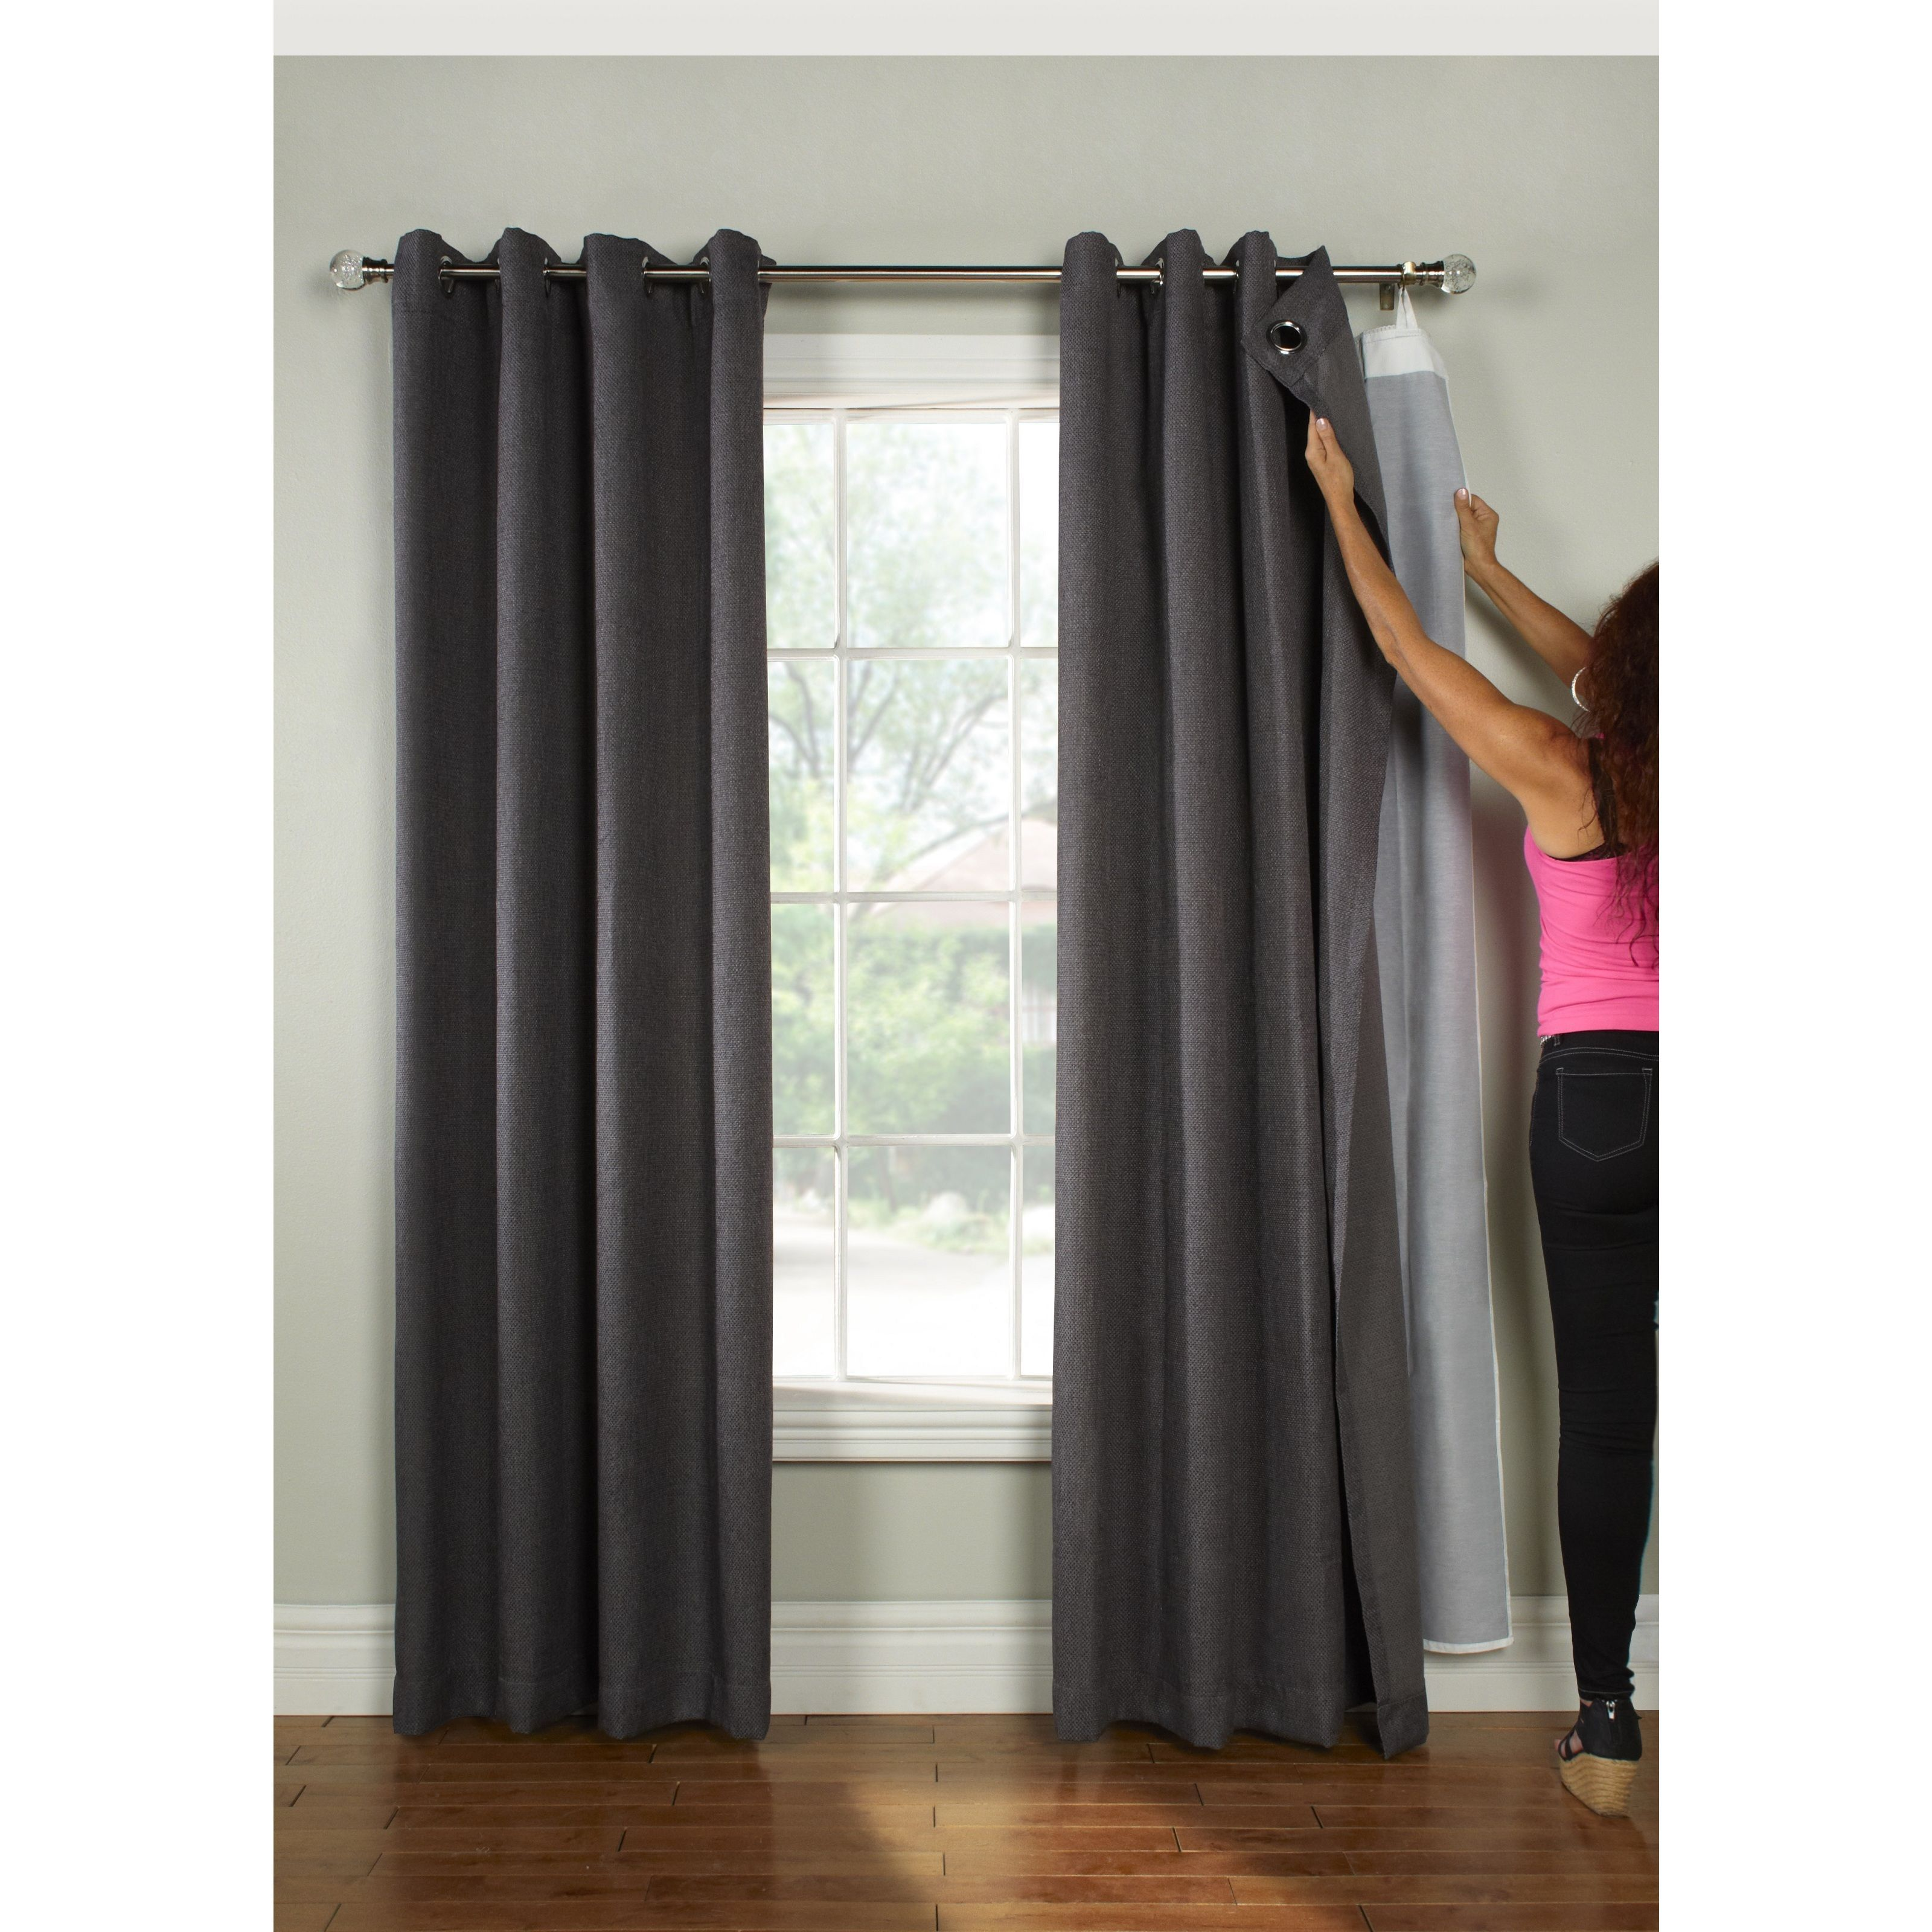 drape drapes blackout curtains for drapery amp elegant of liner less